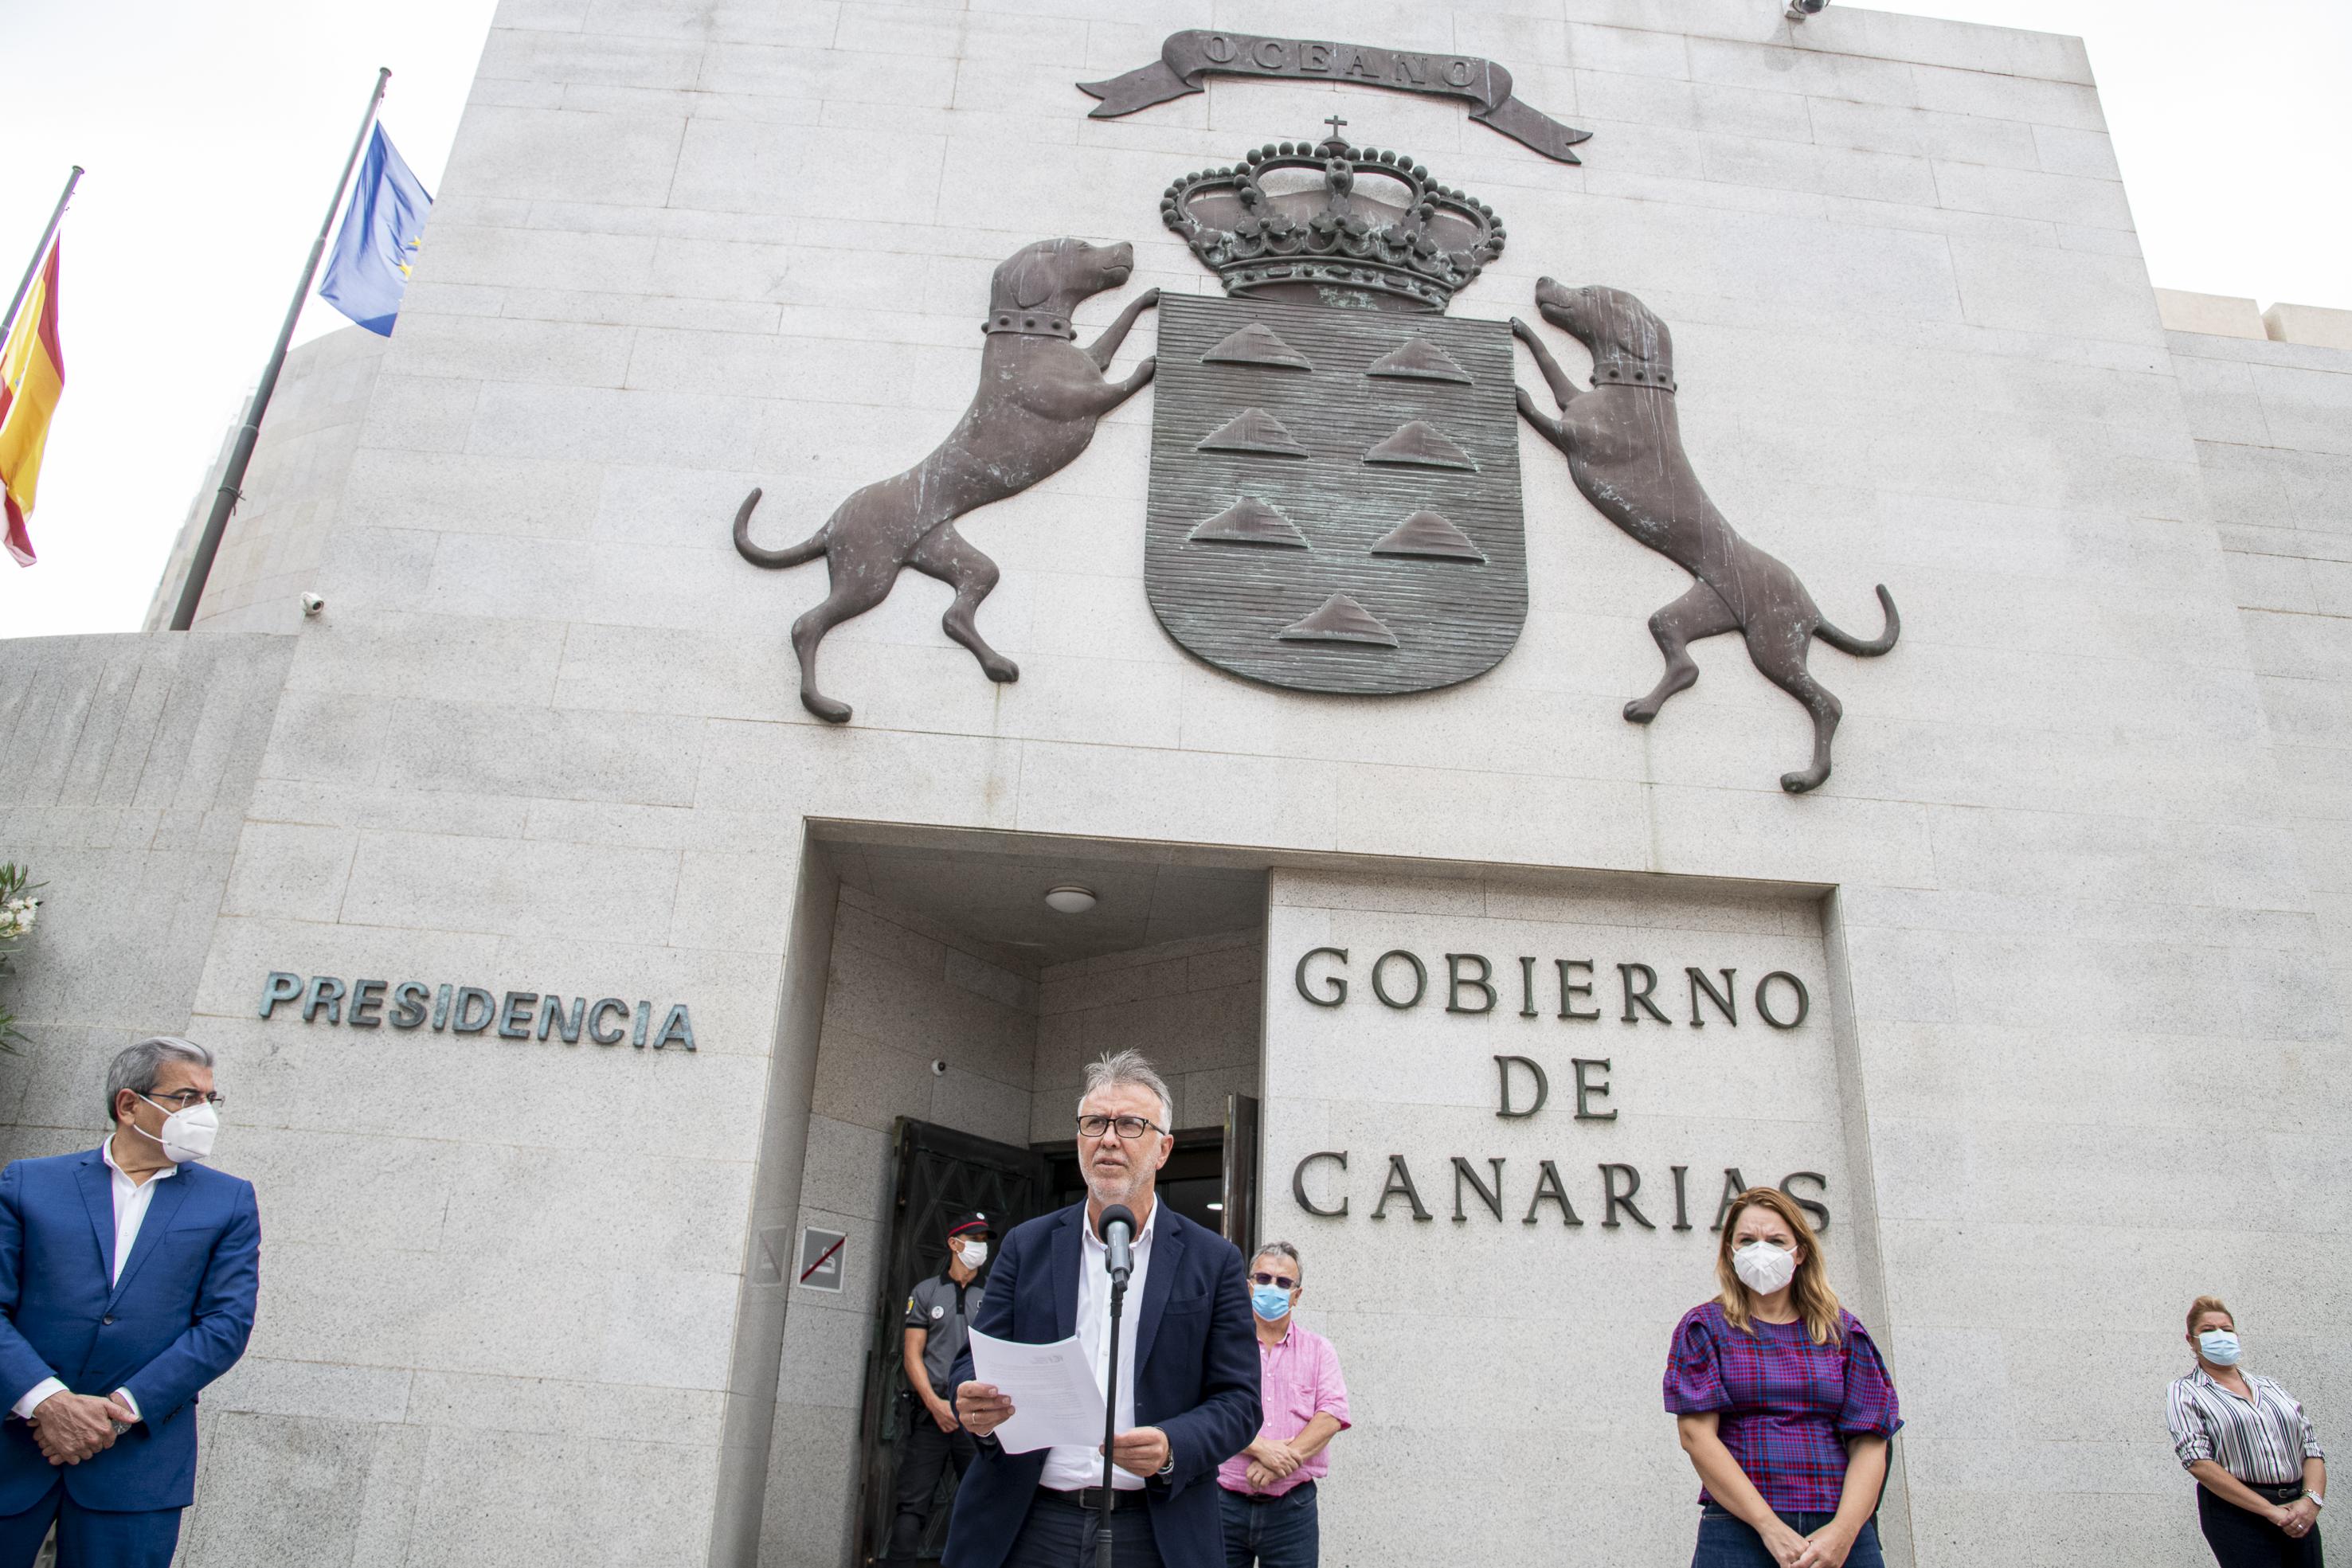 Ángel Víctor Torres leyó el manifiesto institucional de repulsa